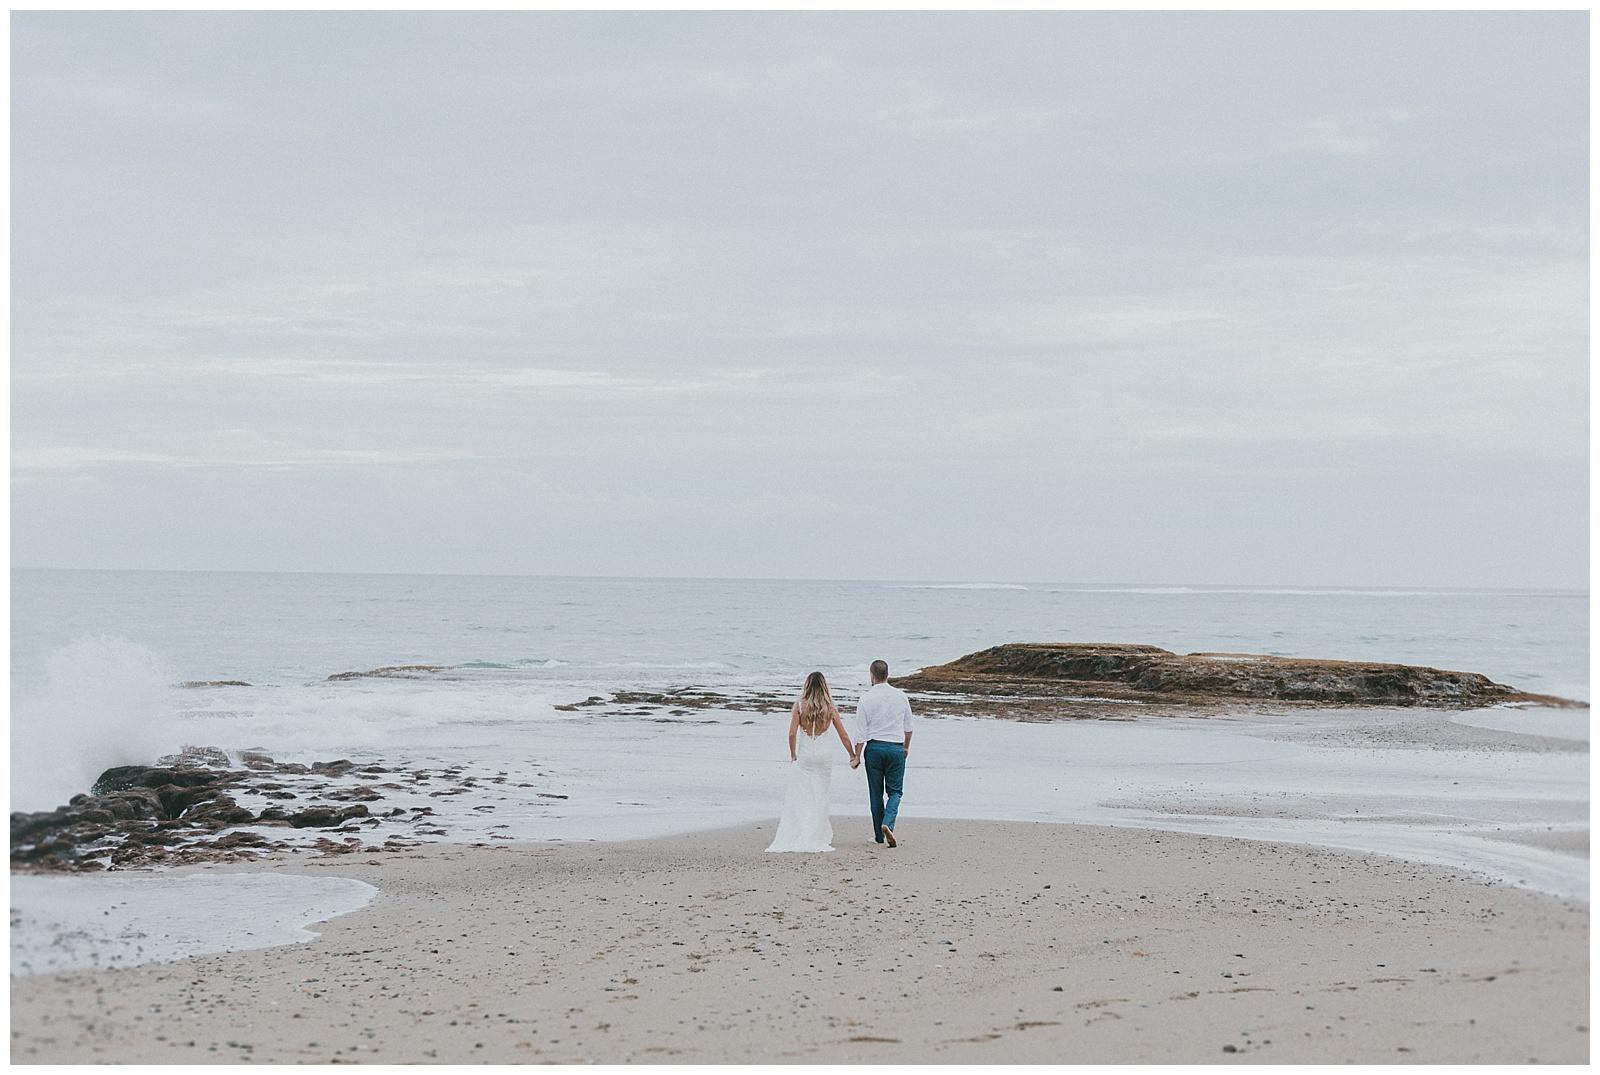 FIJI wedding photographer popcorn photography_0050.jpg